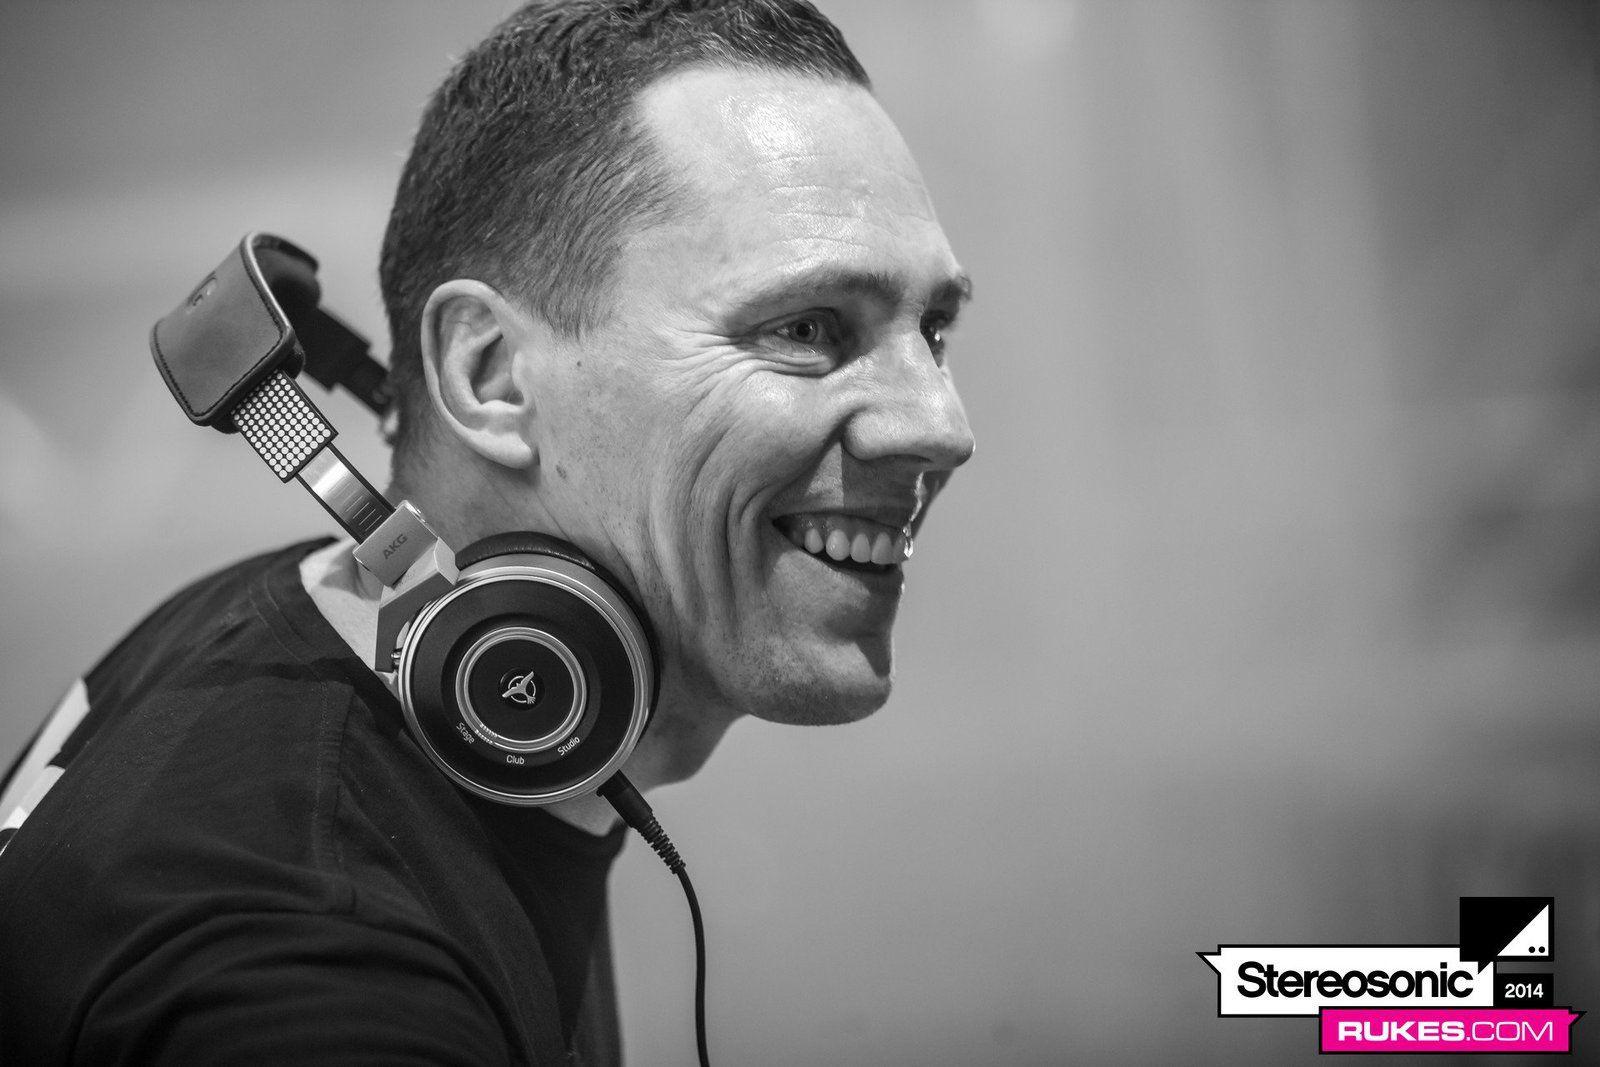 Tiësto photos: Stereosonic - Adelaide, Australia 05 december 2014